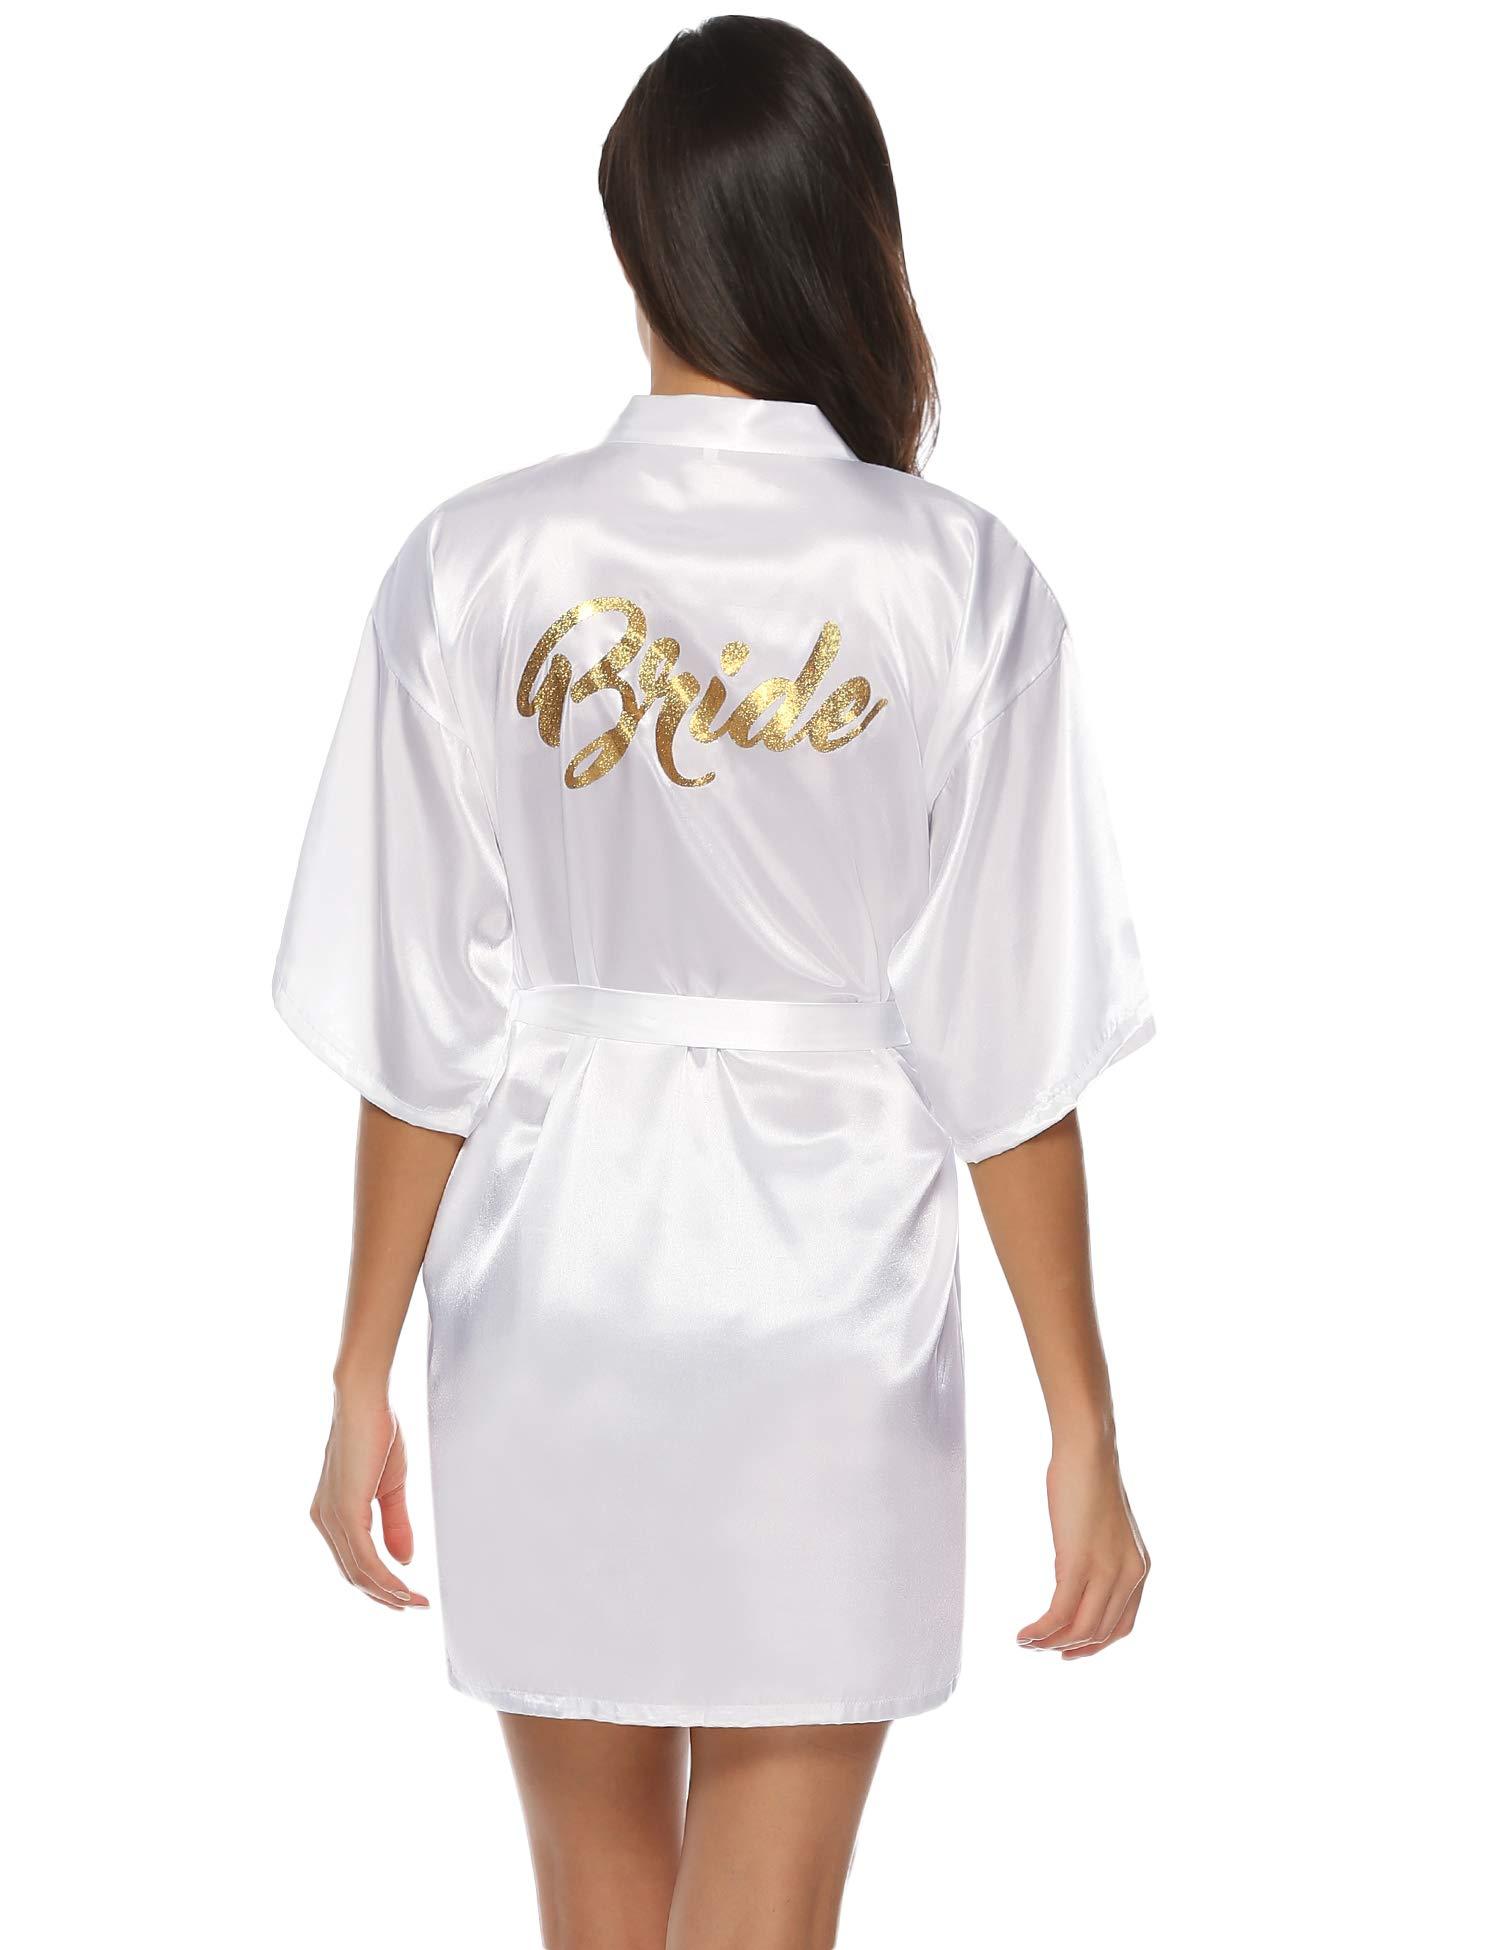 Aibrou Kimono Mujer Bata Novia Dama de Honor Saten Batas Cortos Lenceria de Aspecto Brillante product image